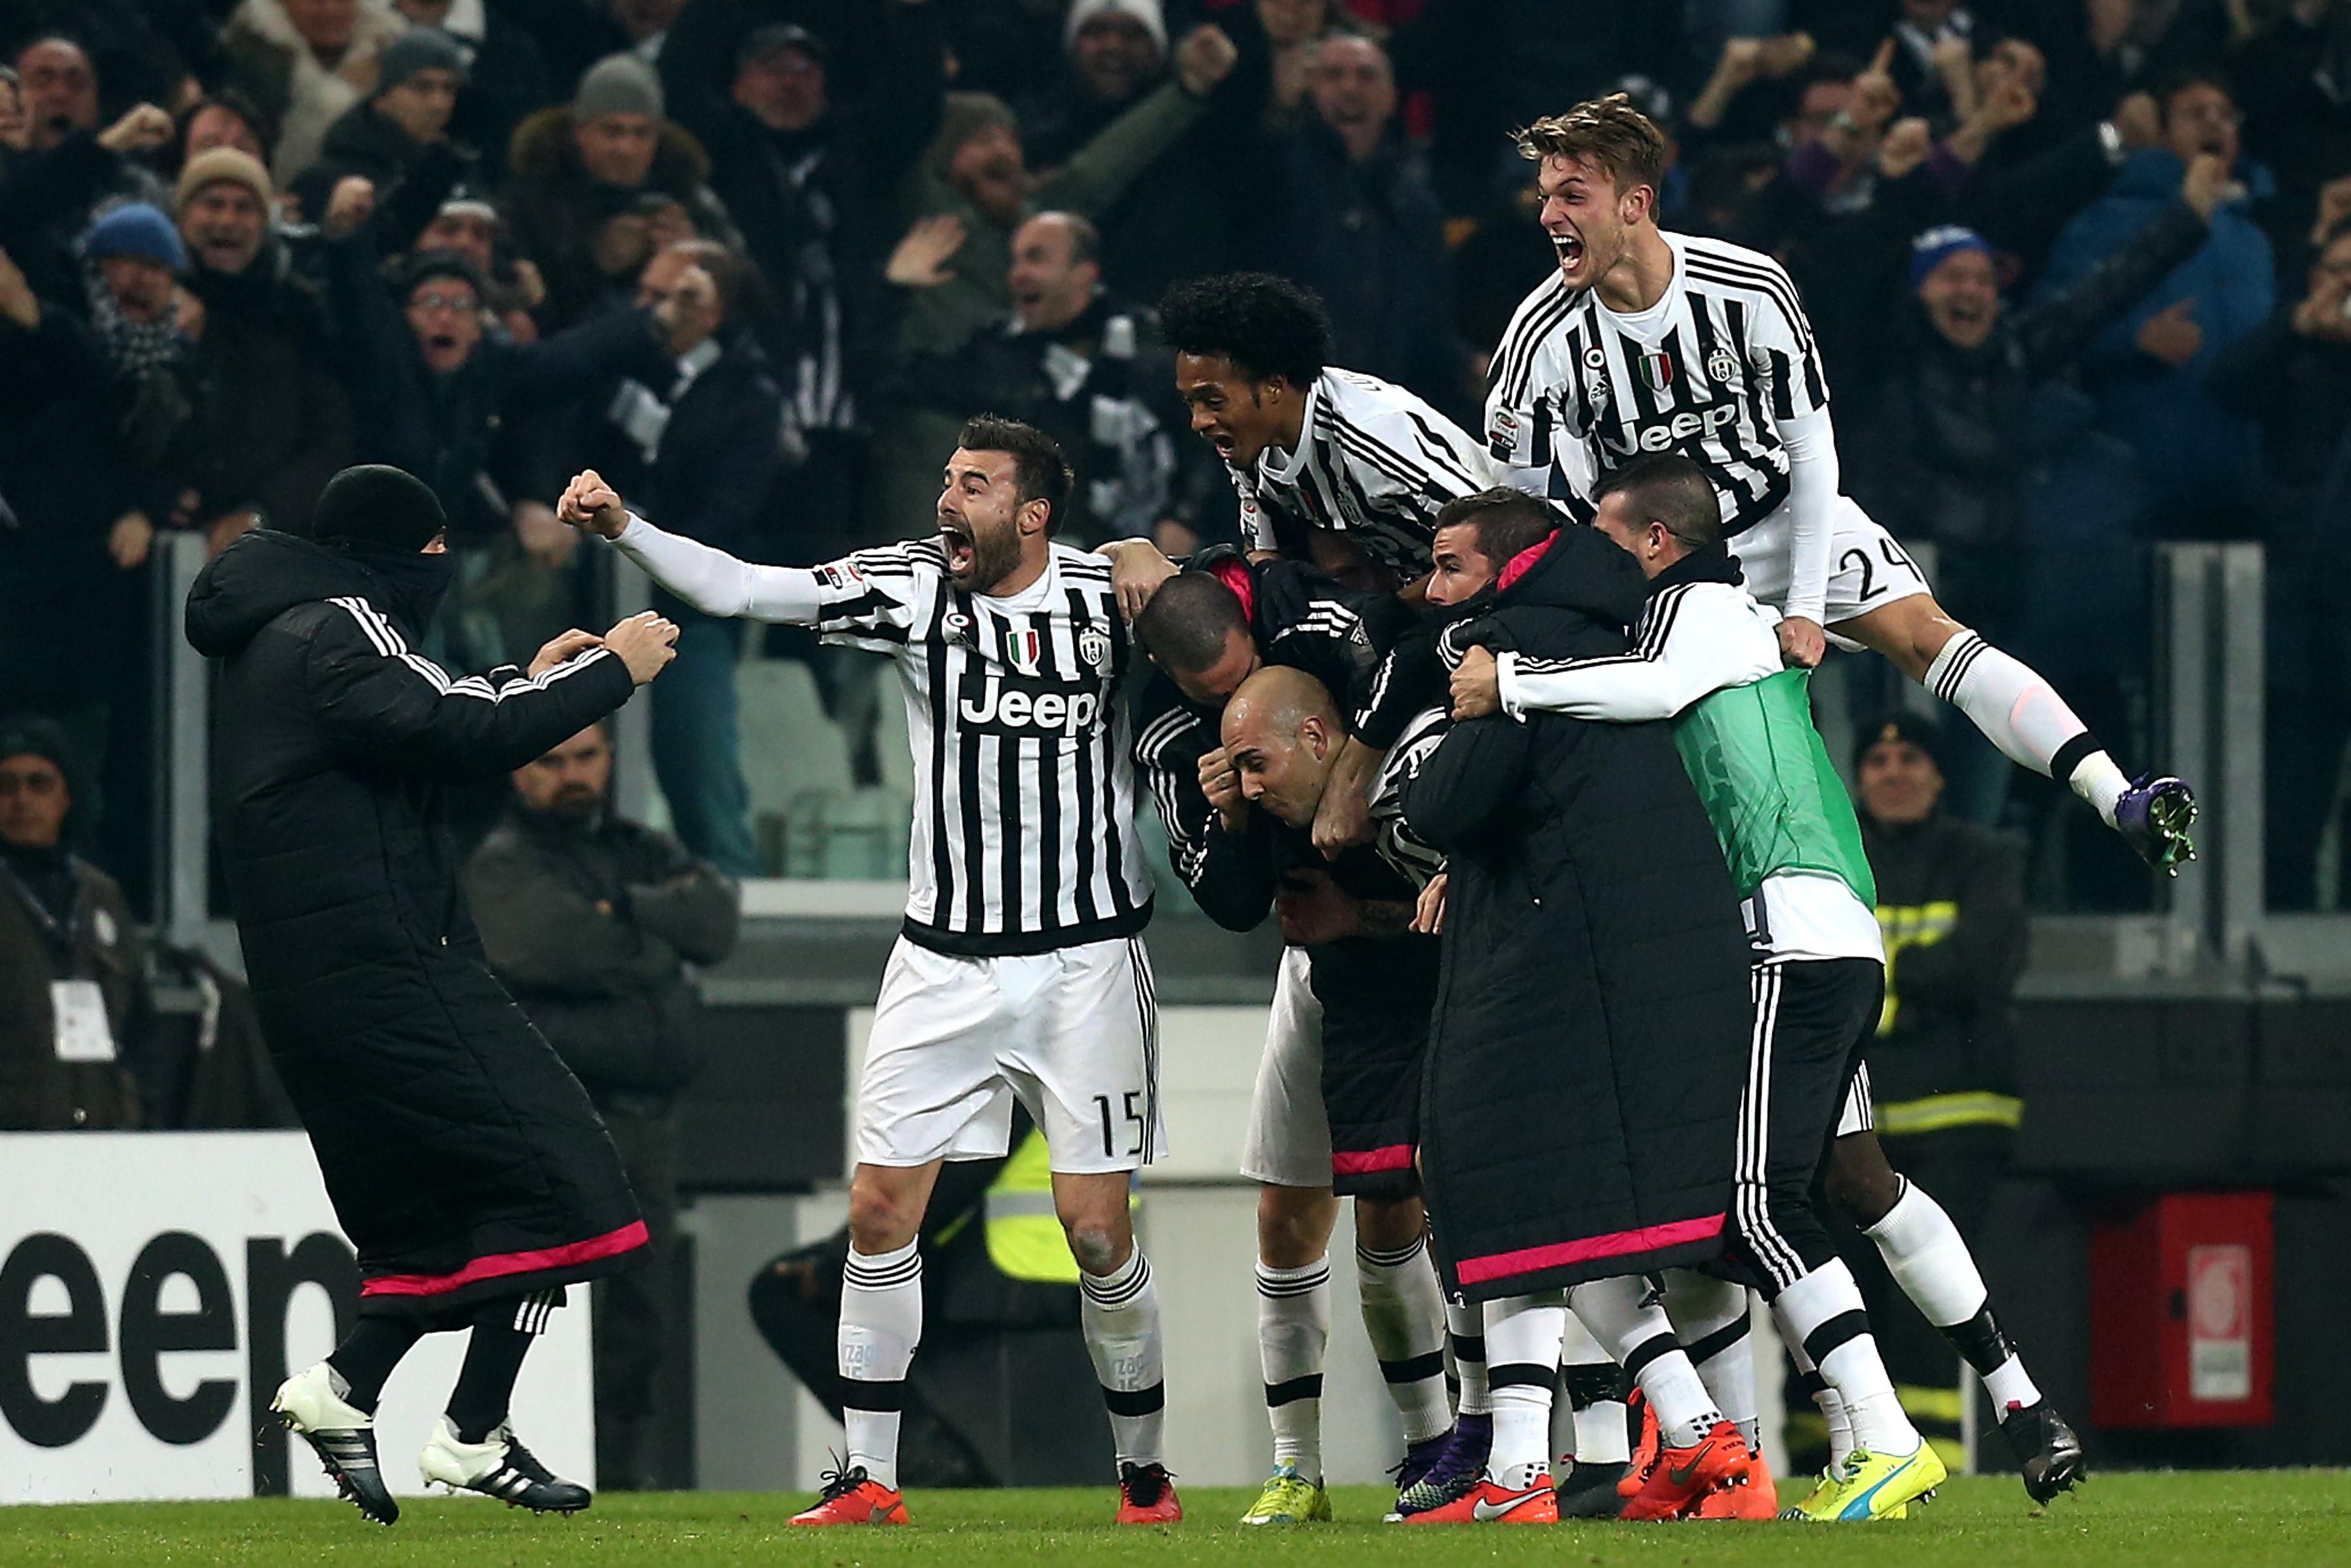 "Juventus' forward Simone Zaza (C ) celebrates with teammates after scoring during the Italian Serie A football match Juventus Vs Napoli on February 13, 2016 at the ""Juventus Stadium"" in Turin."